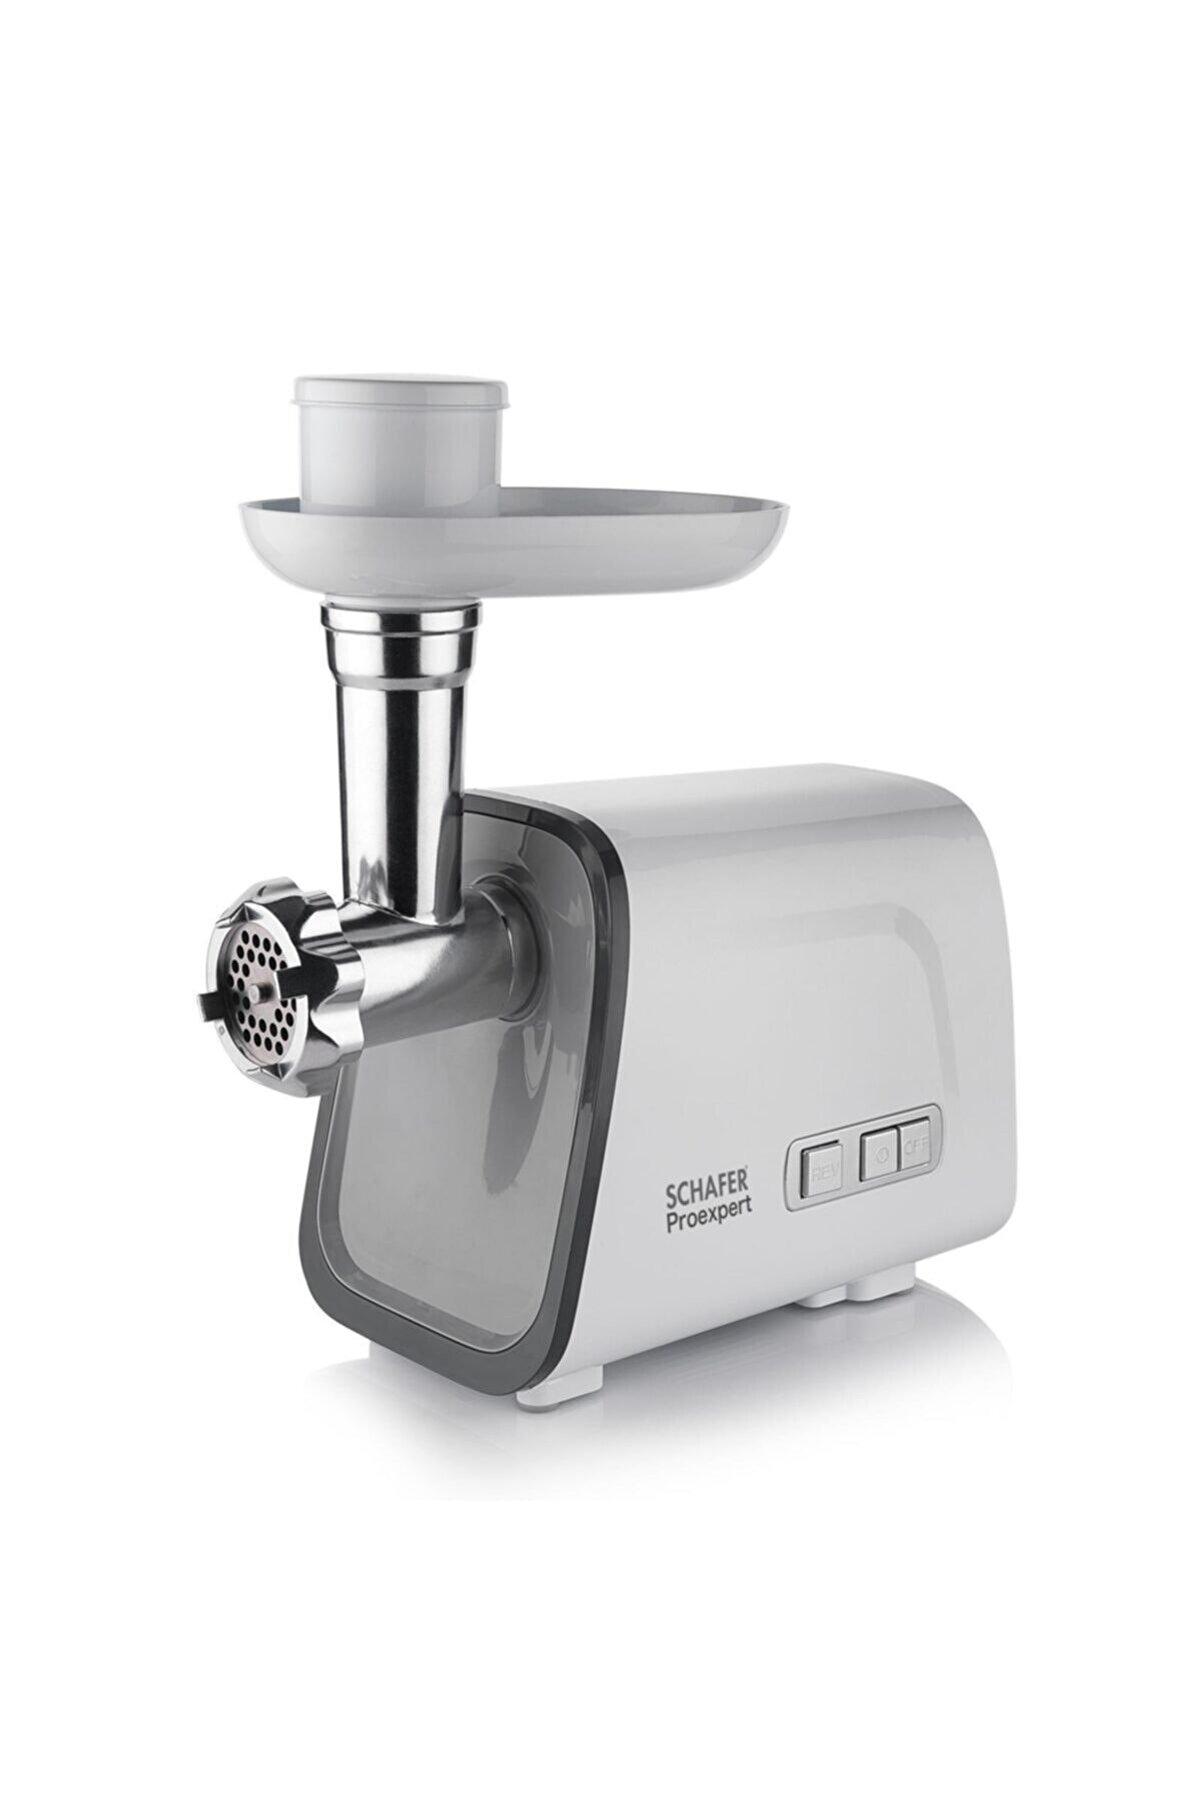 Schafer Pro Expert Kıyma Makinesi - Beyaz